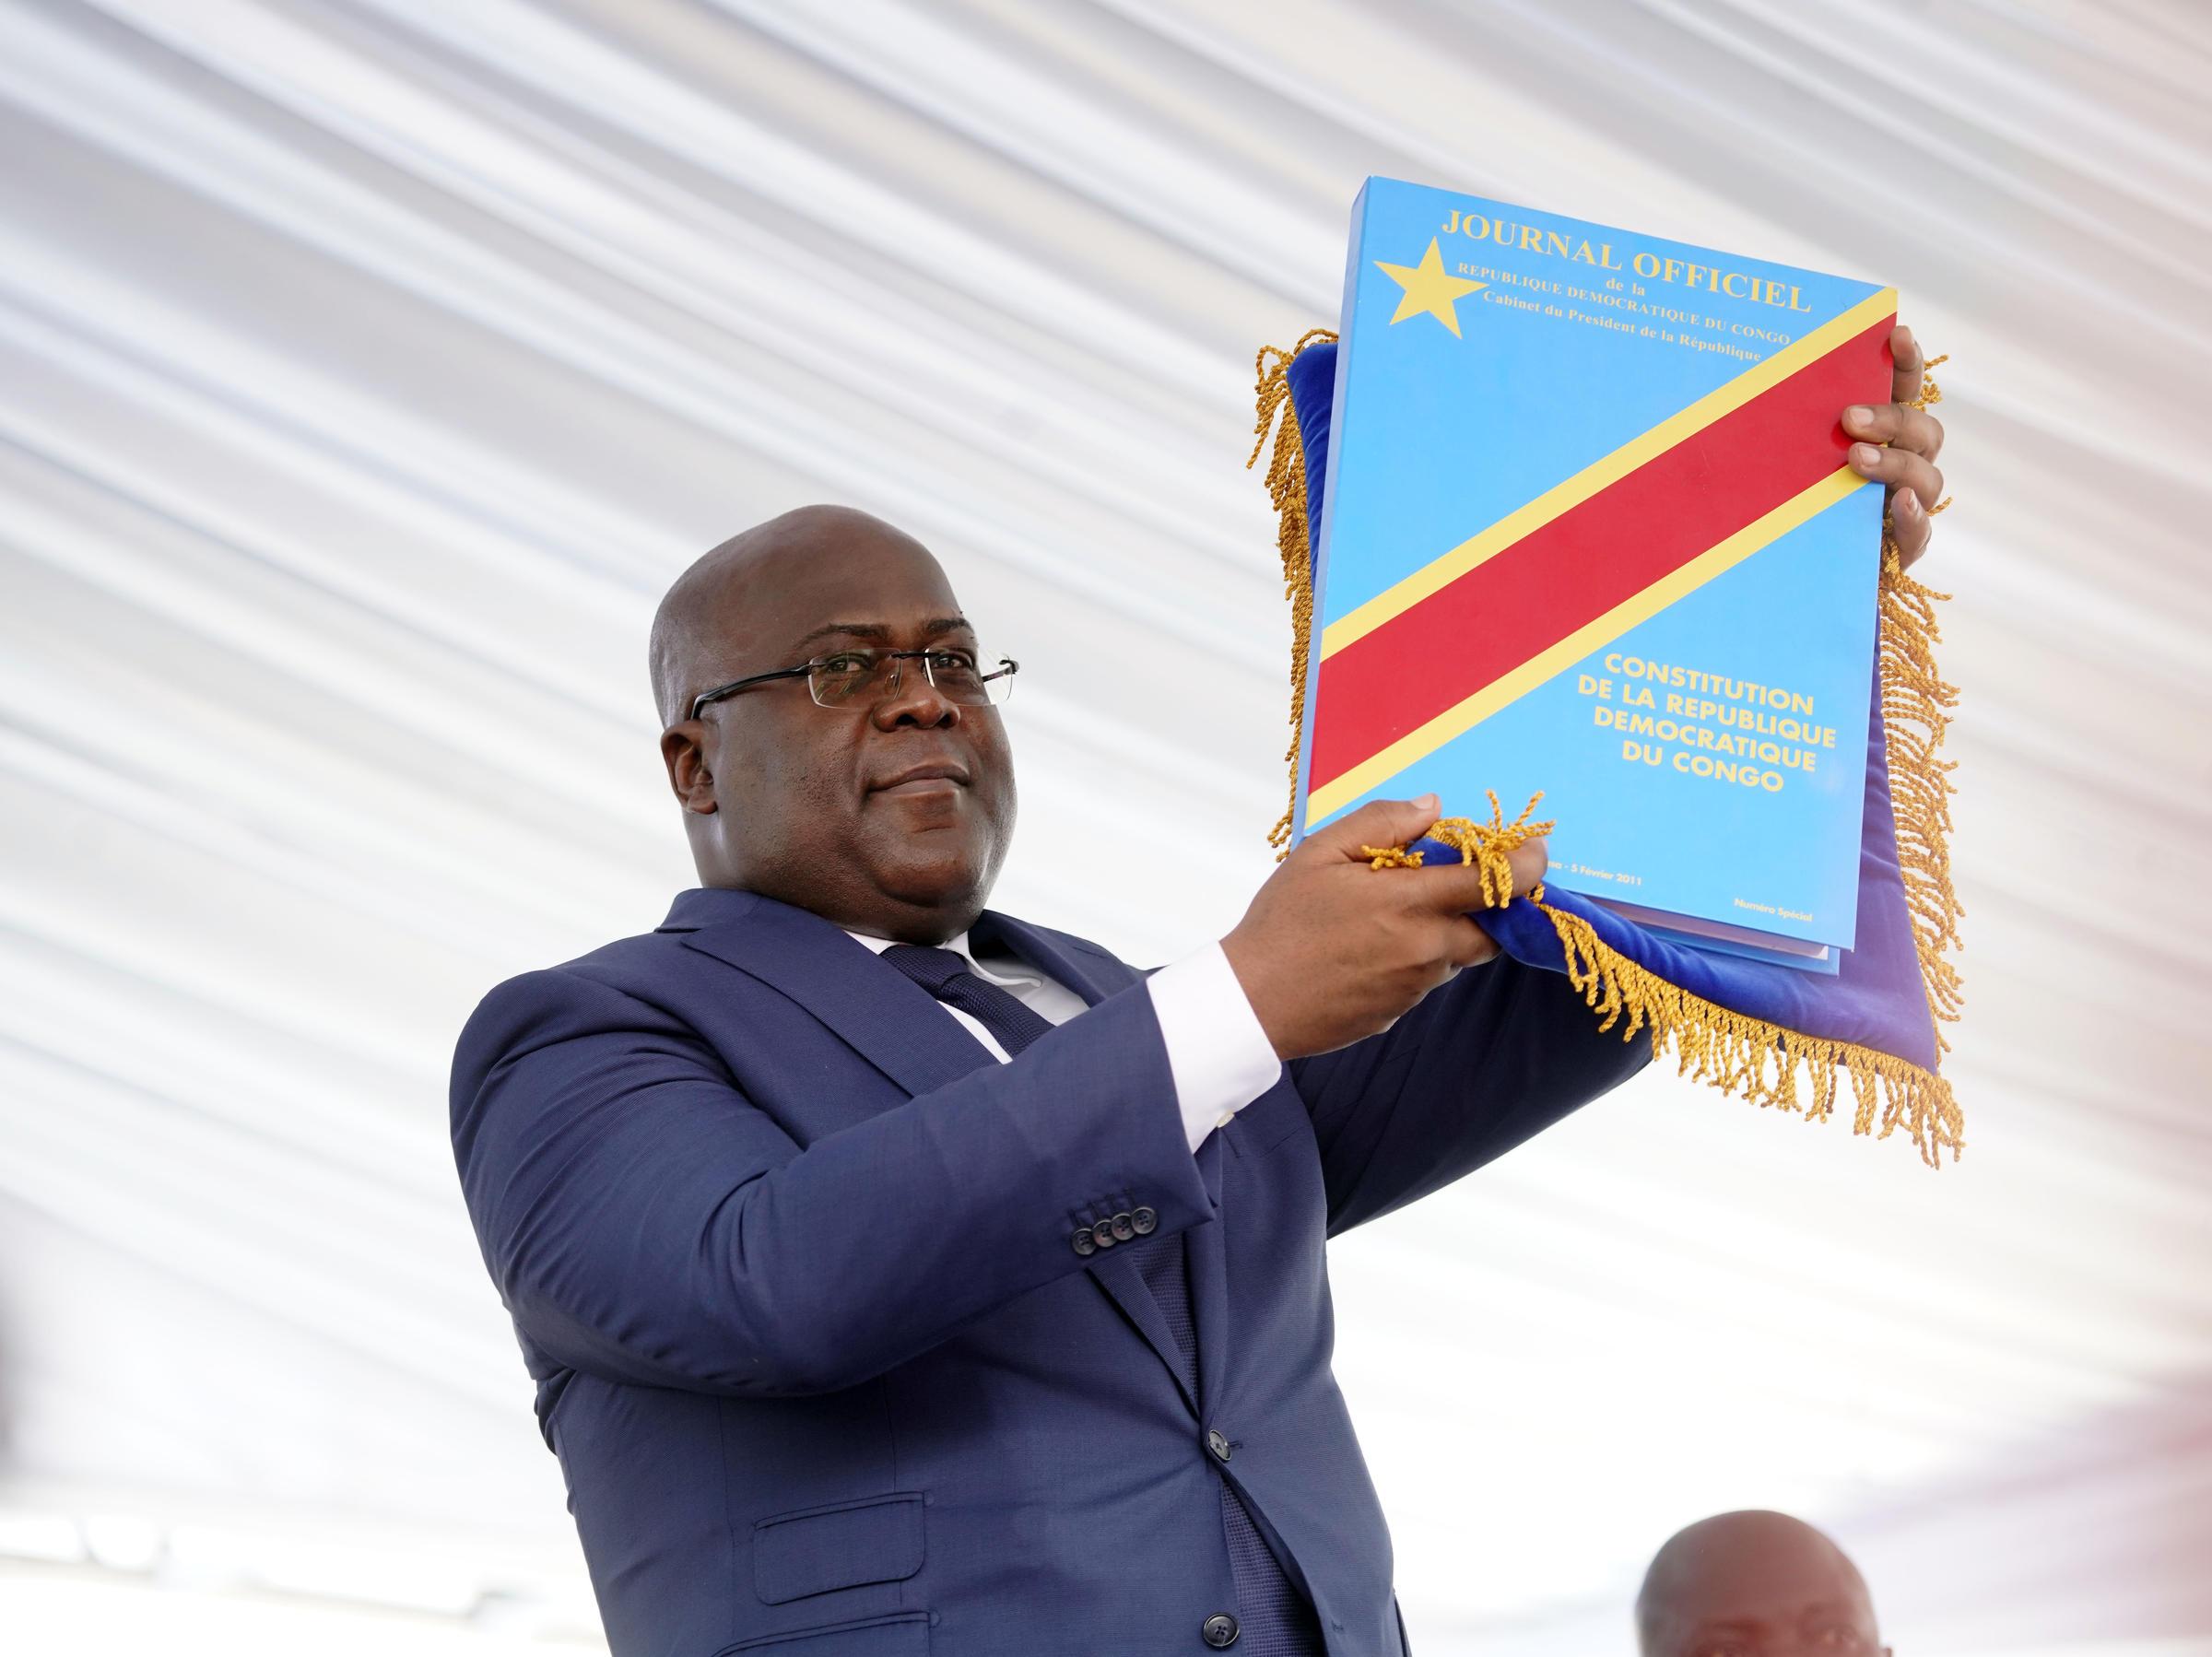 Major credibility test for Tshisekedi